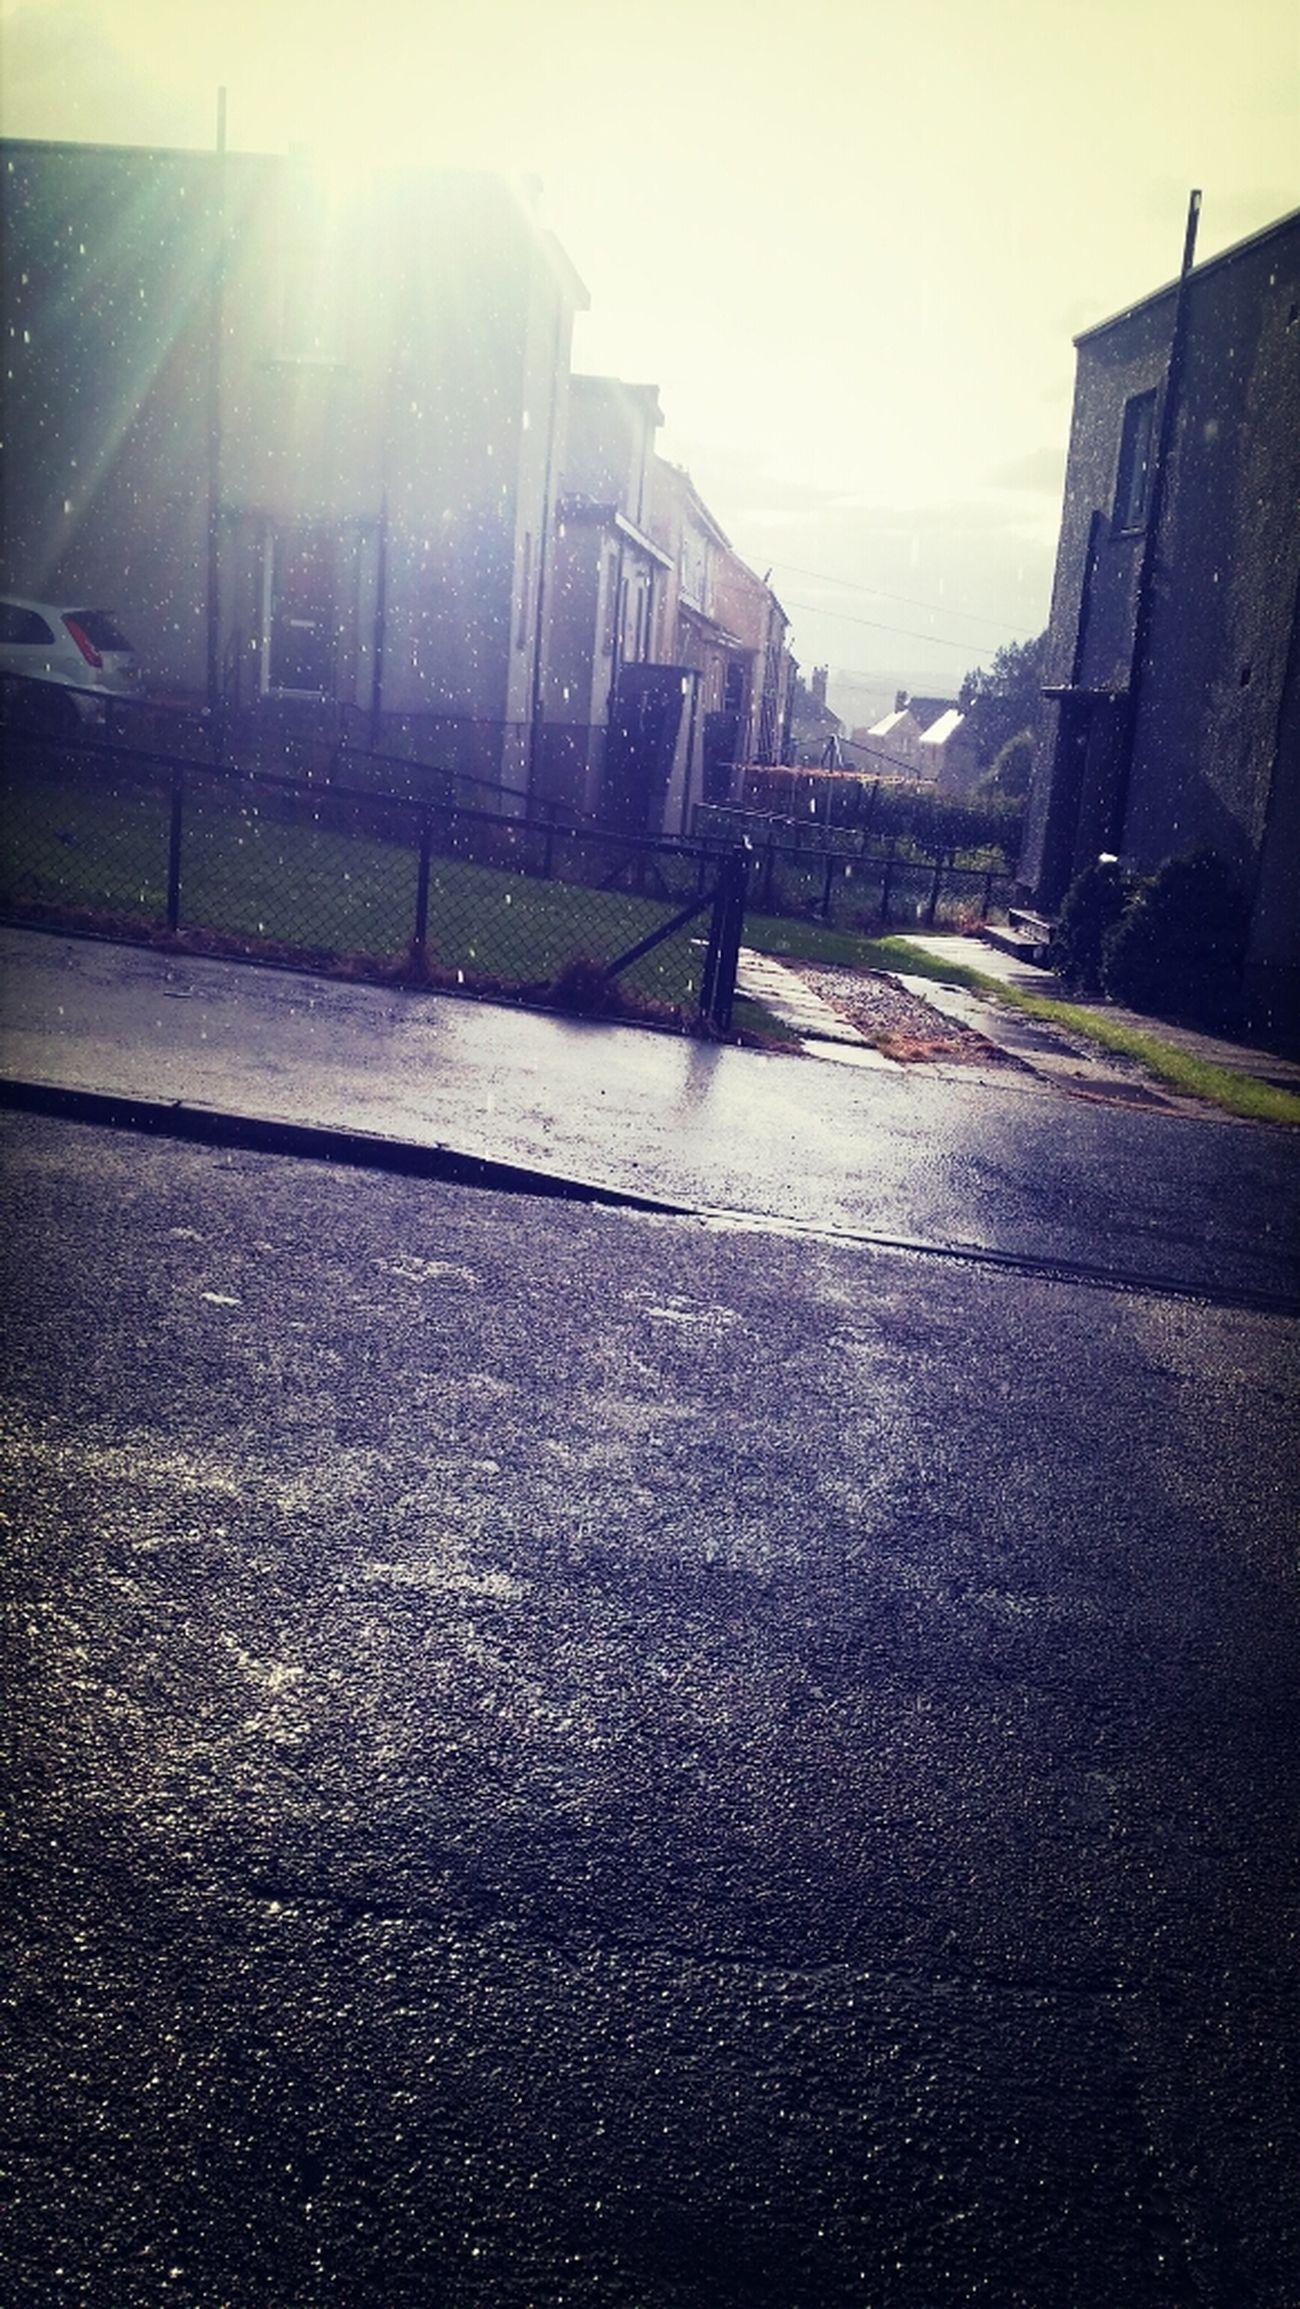 Only in aberdeen rain and sun at the same time Rain ♥ Sun ☀ Loveitandhateitatthesametime